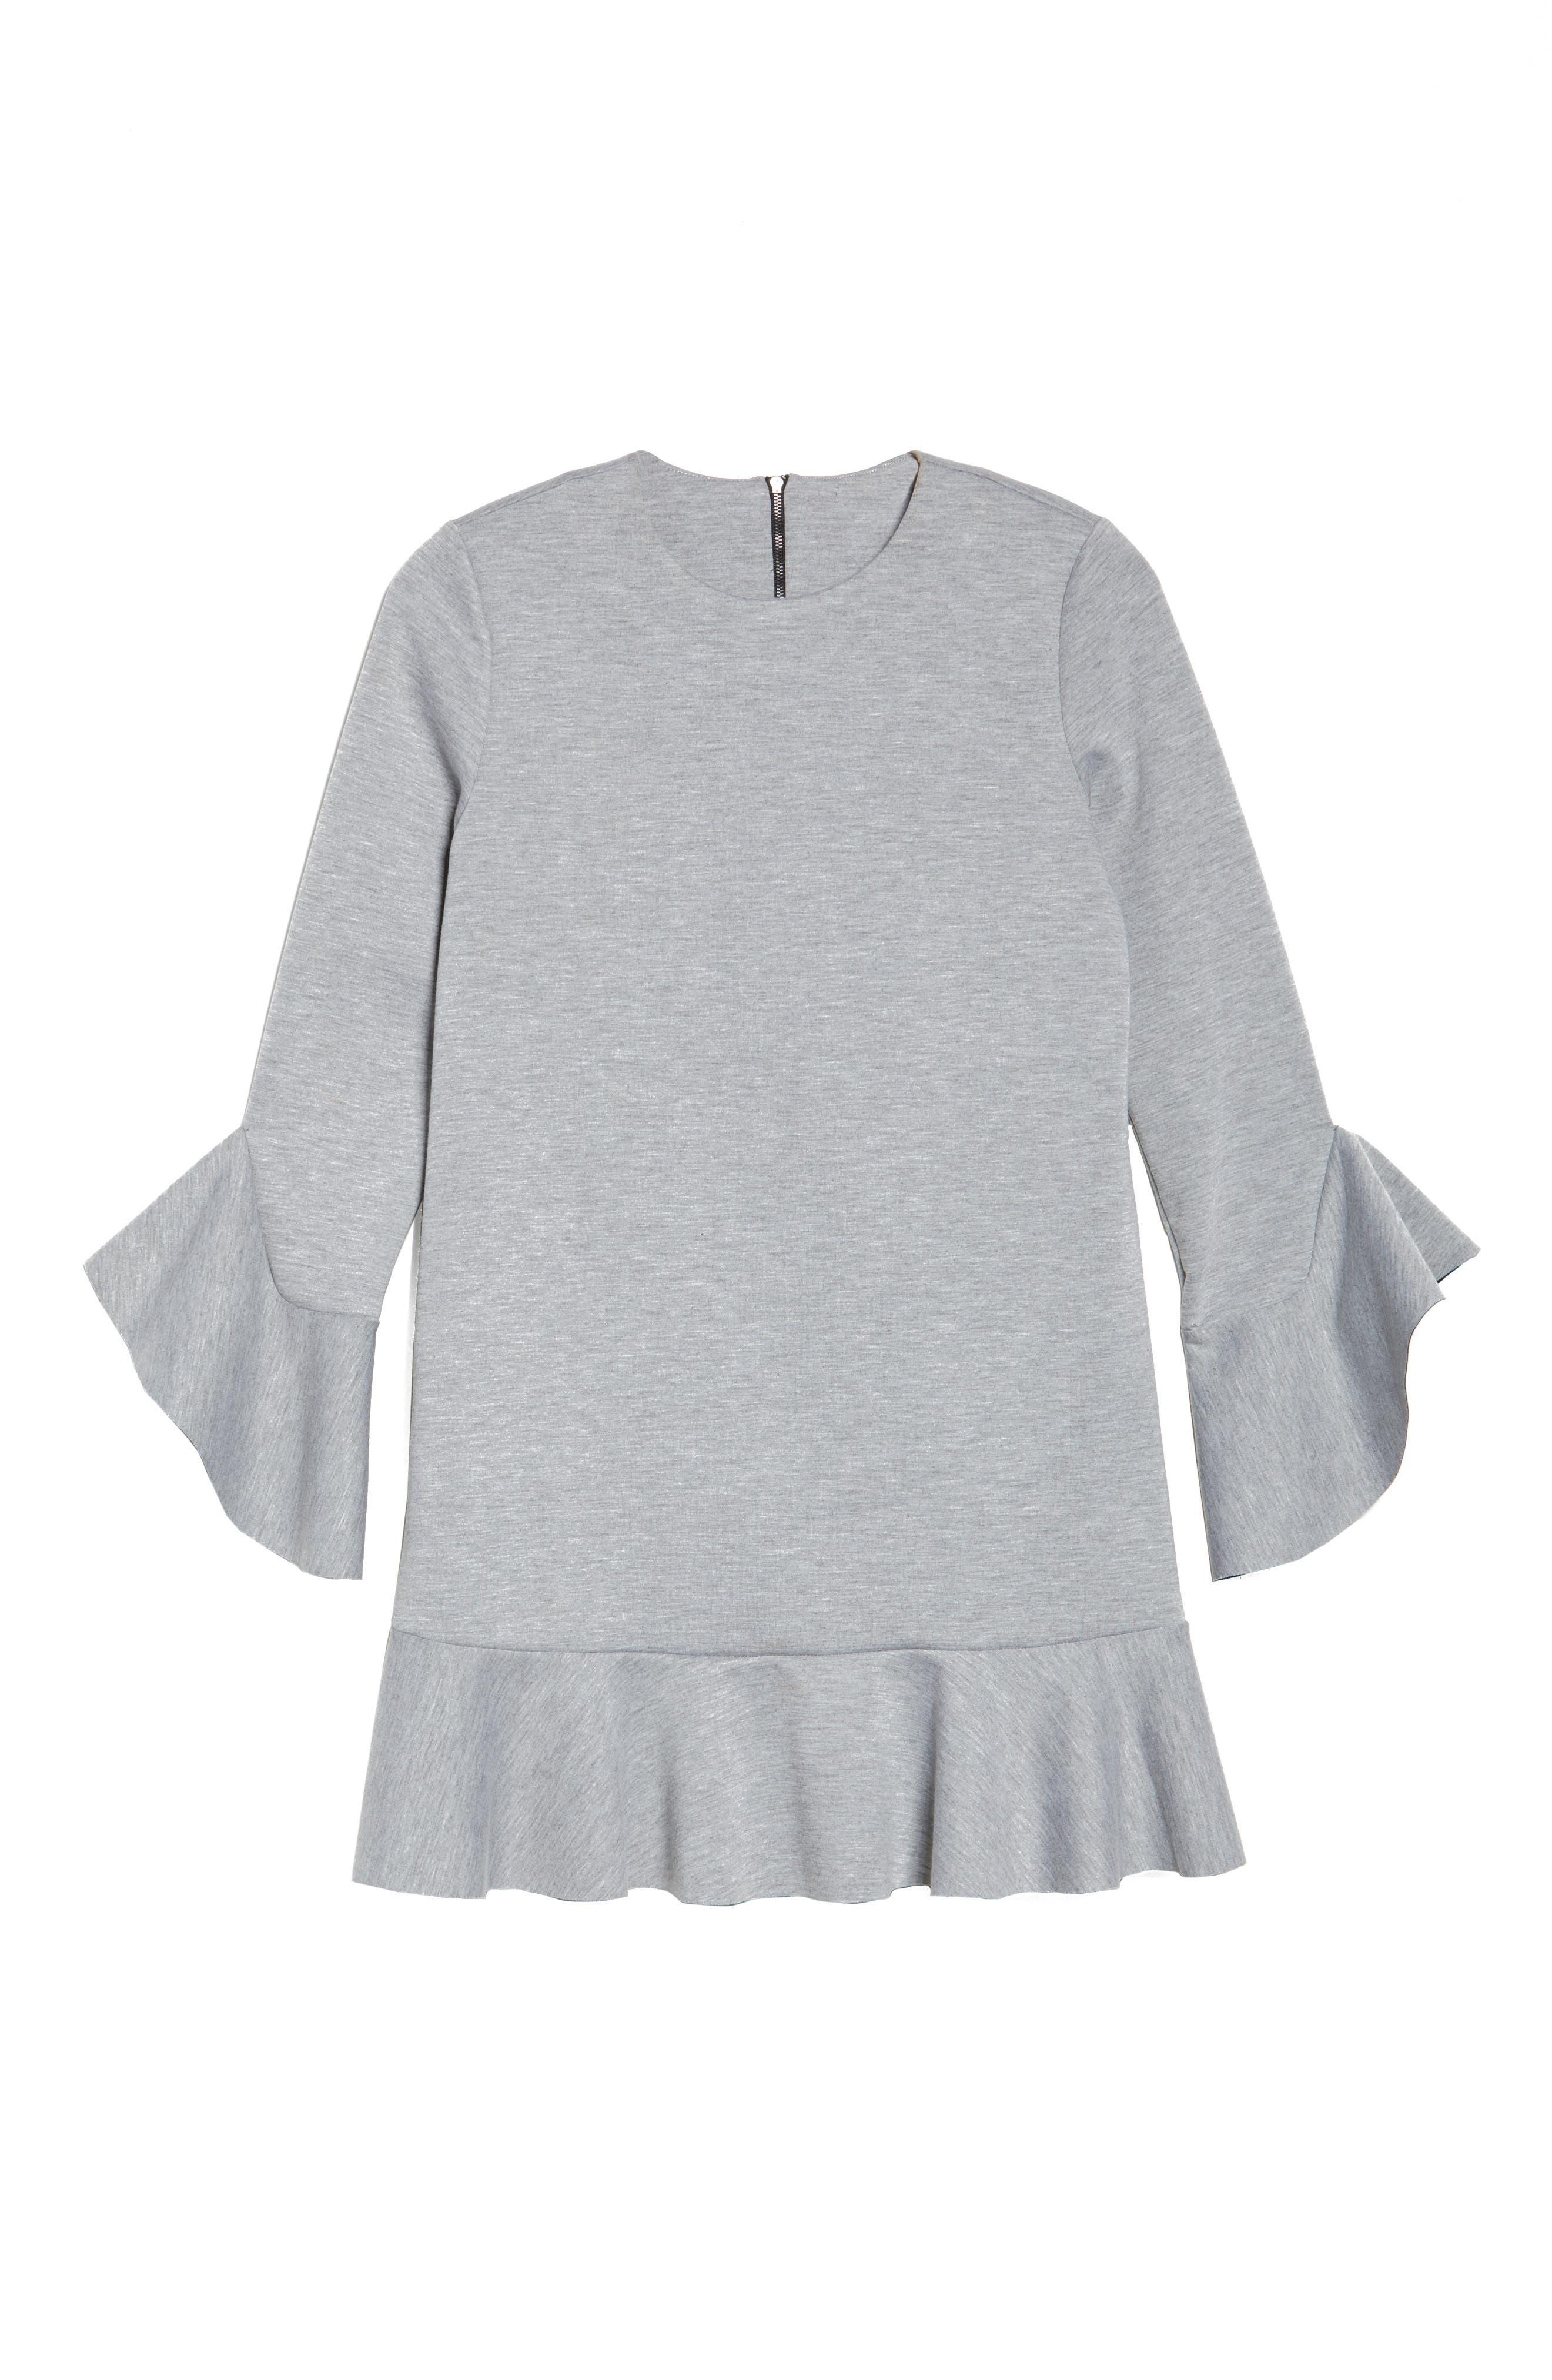 Ruffle Scuba Dress,                             Alternate thumbnail 7, color,                             Grey Heather